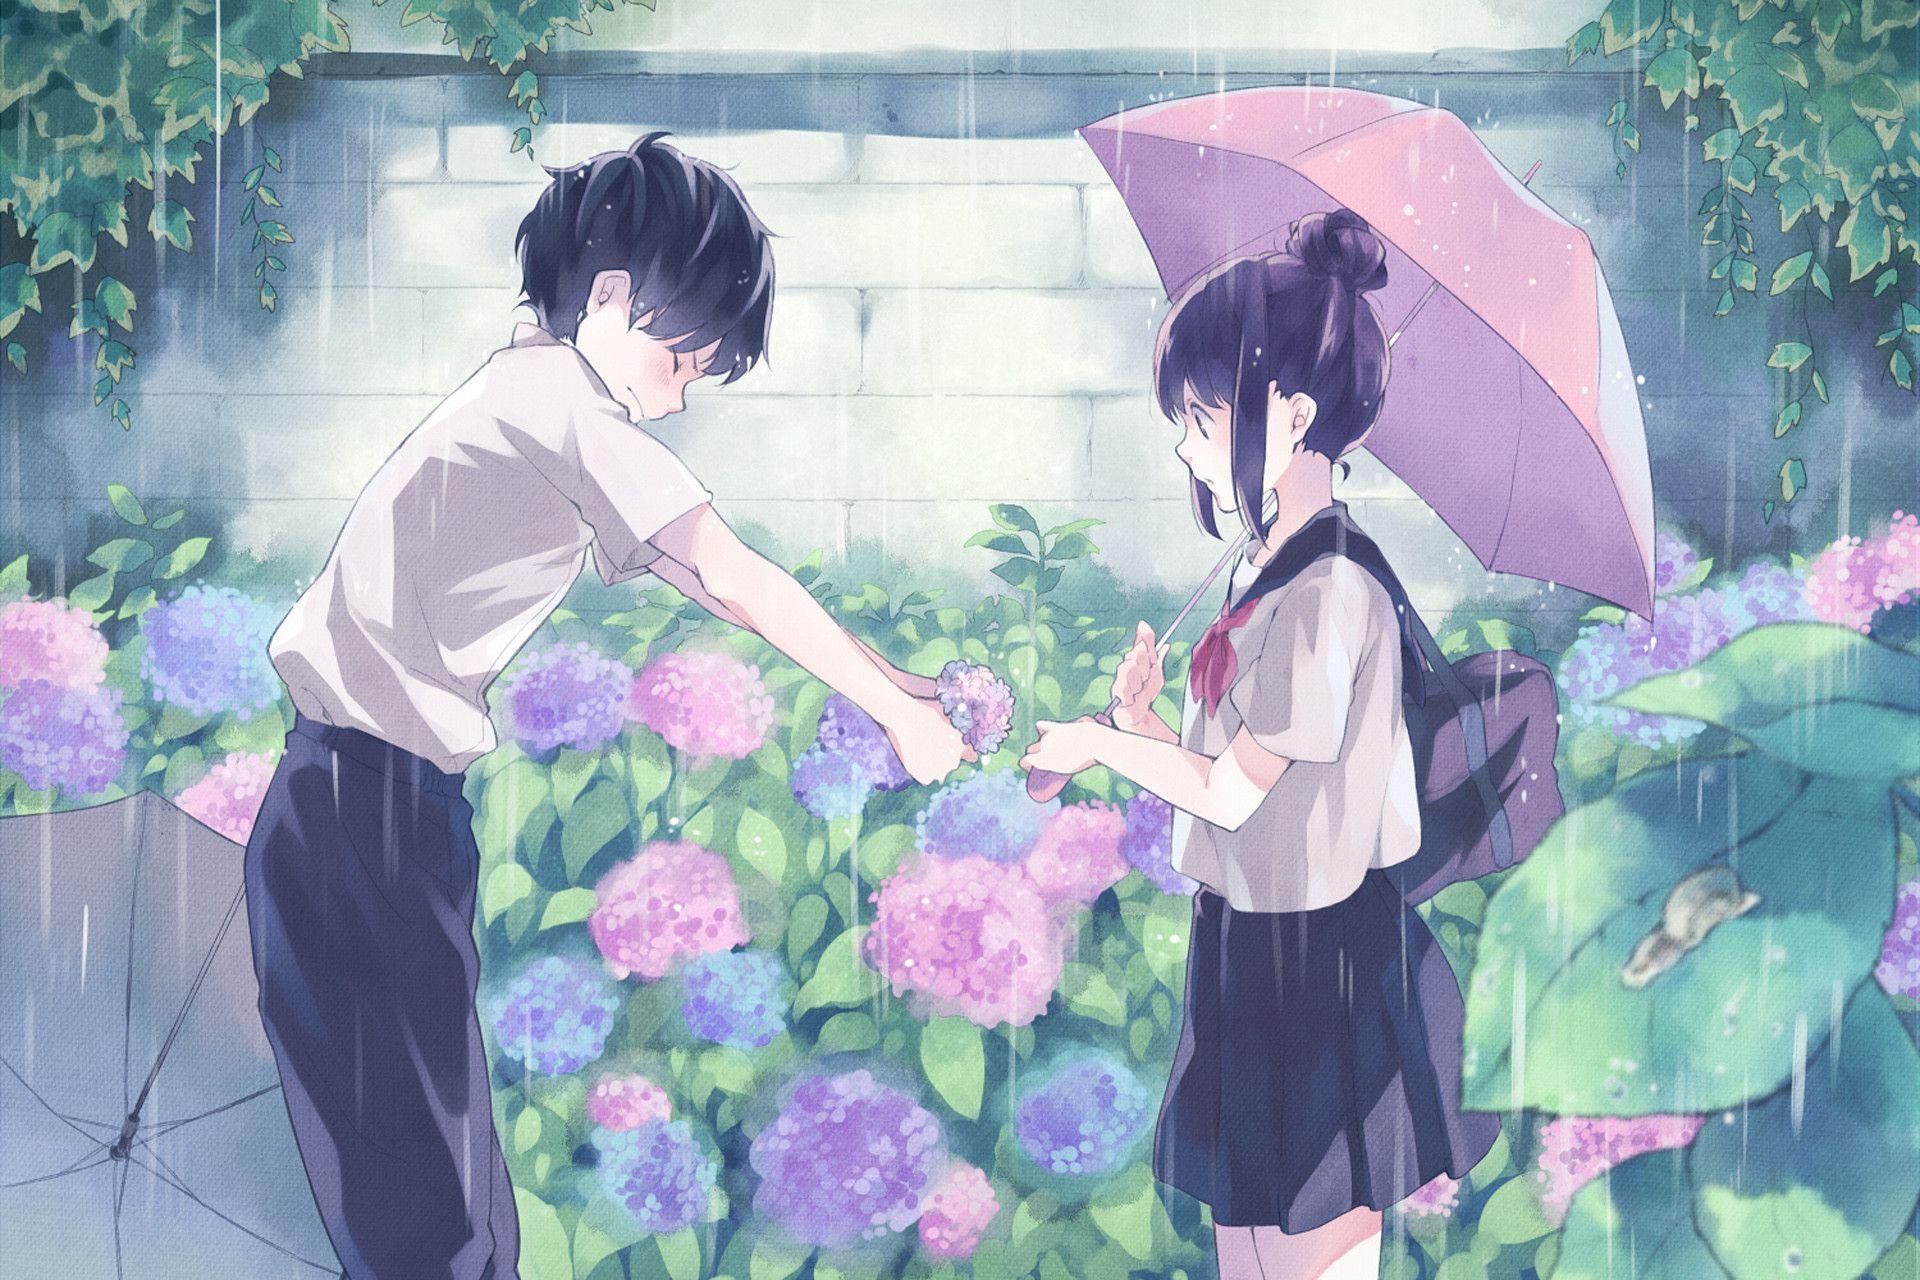 Hd Wallpaper Anime Couple Girl Boy Hug Hd Wallpaper Desktop Pc Background Anime Love Couples Wallpaper Anime Love Anime Love Couple Romantic Anime Anime Love